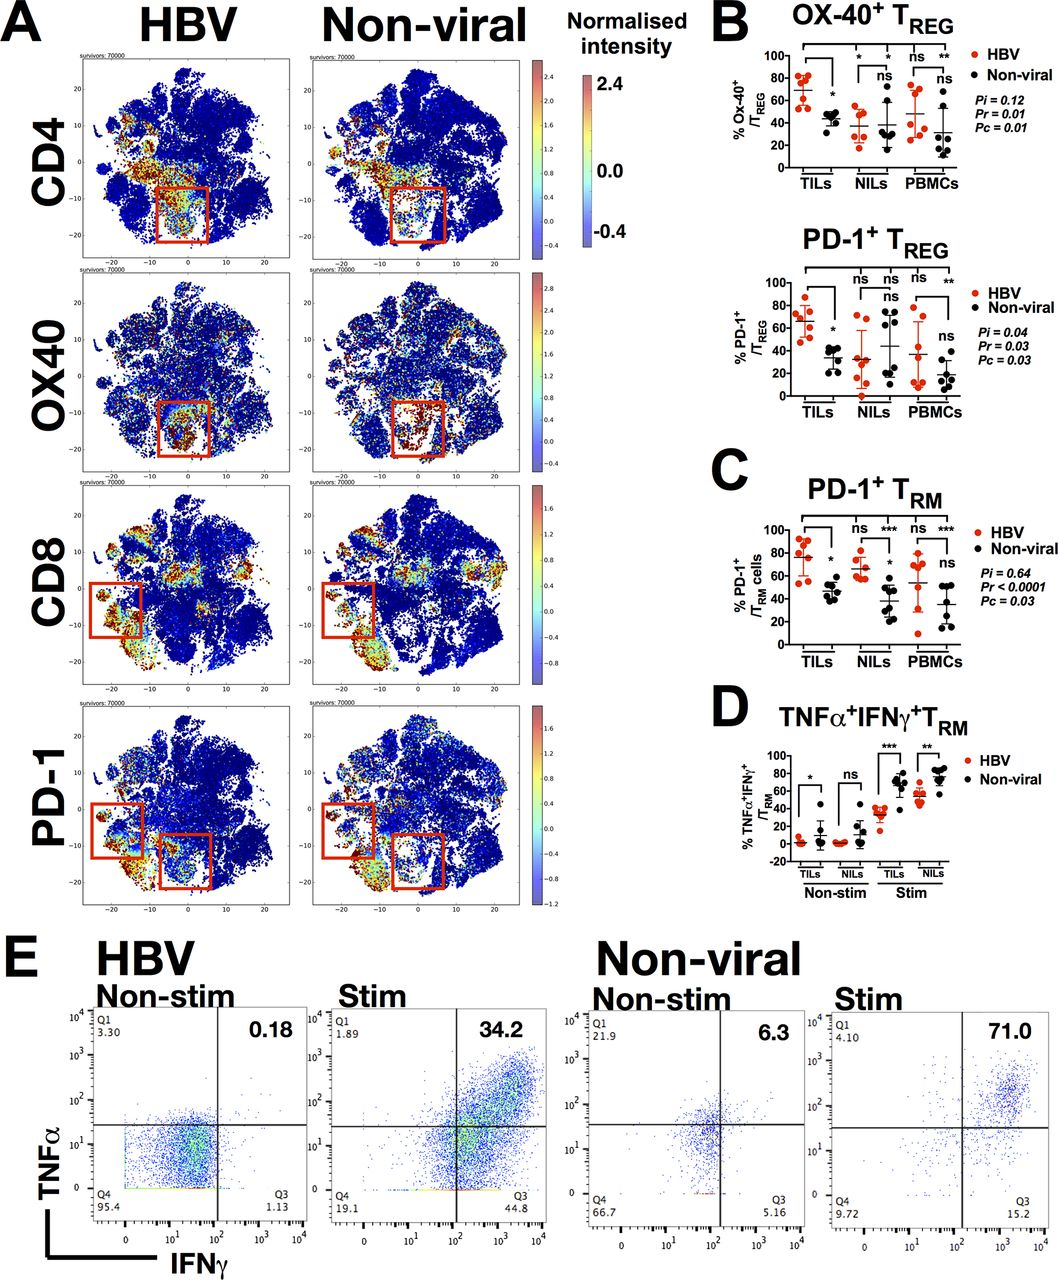 Multidimensional analyses reveal distinct immune microenvironment in